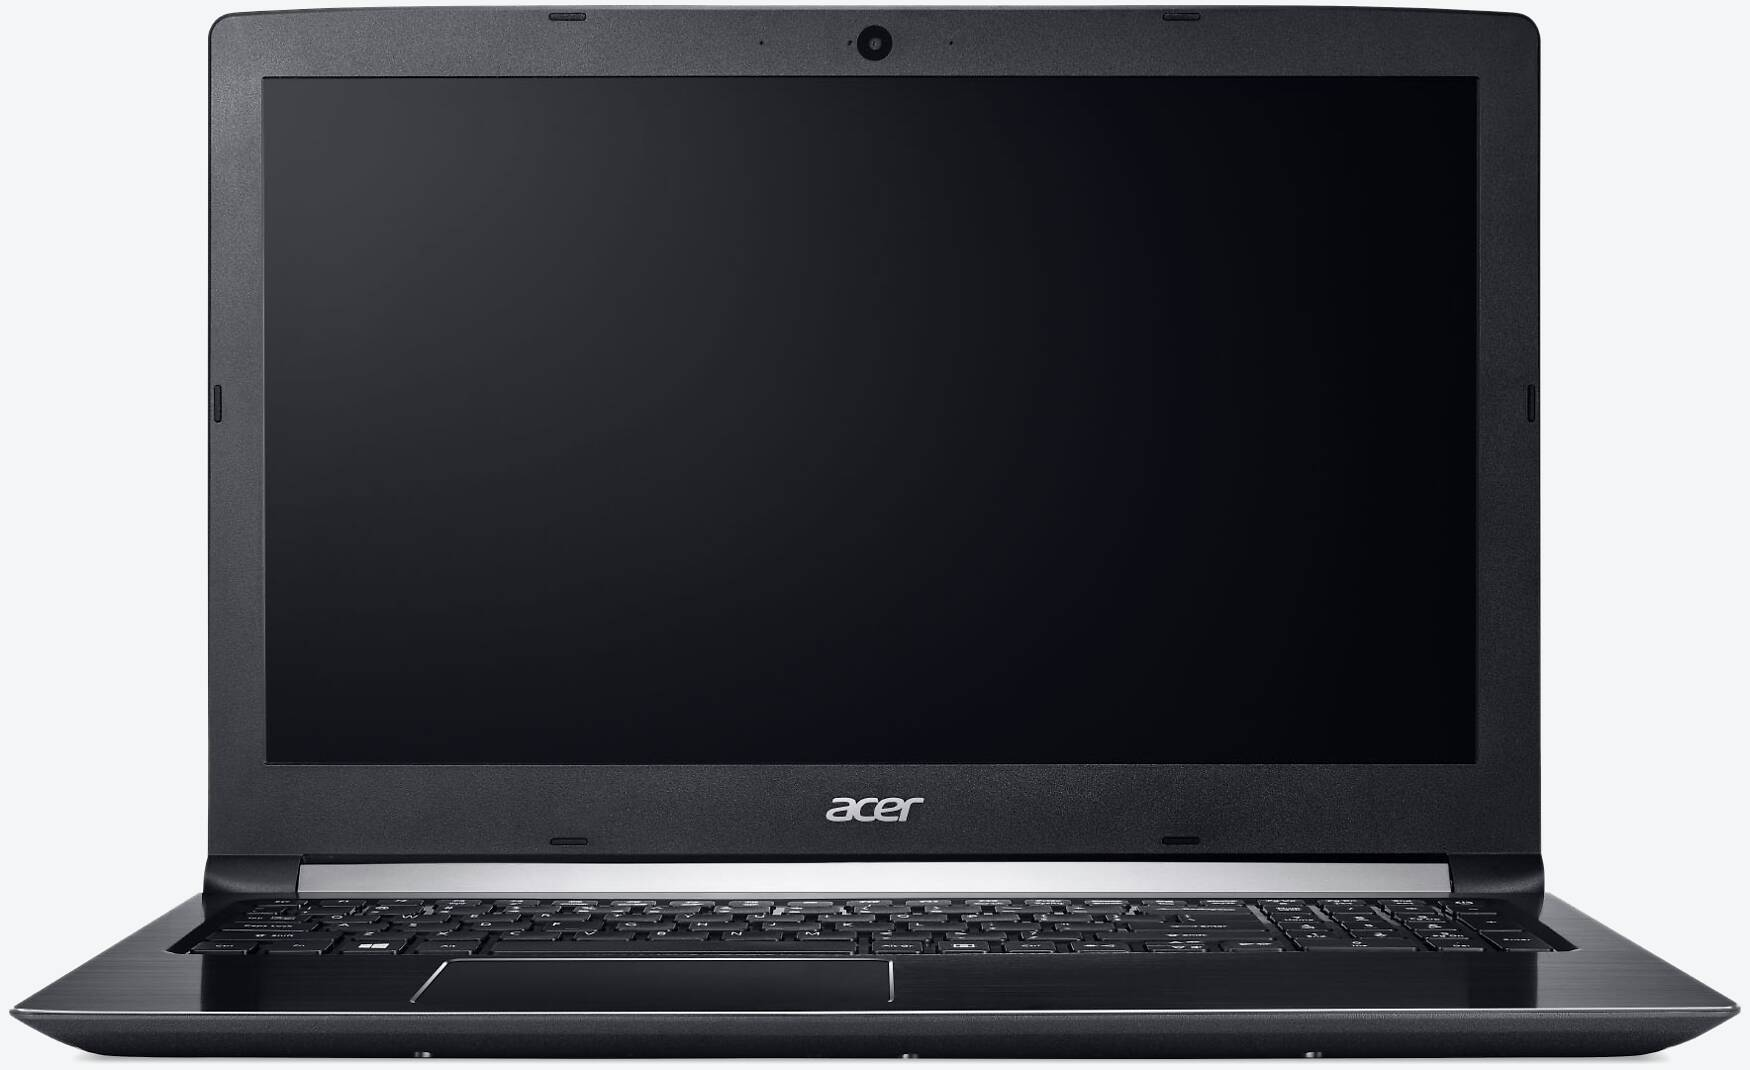 Acer Aspire 5 A517-51-37UK